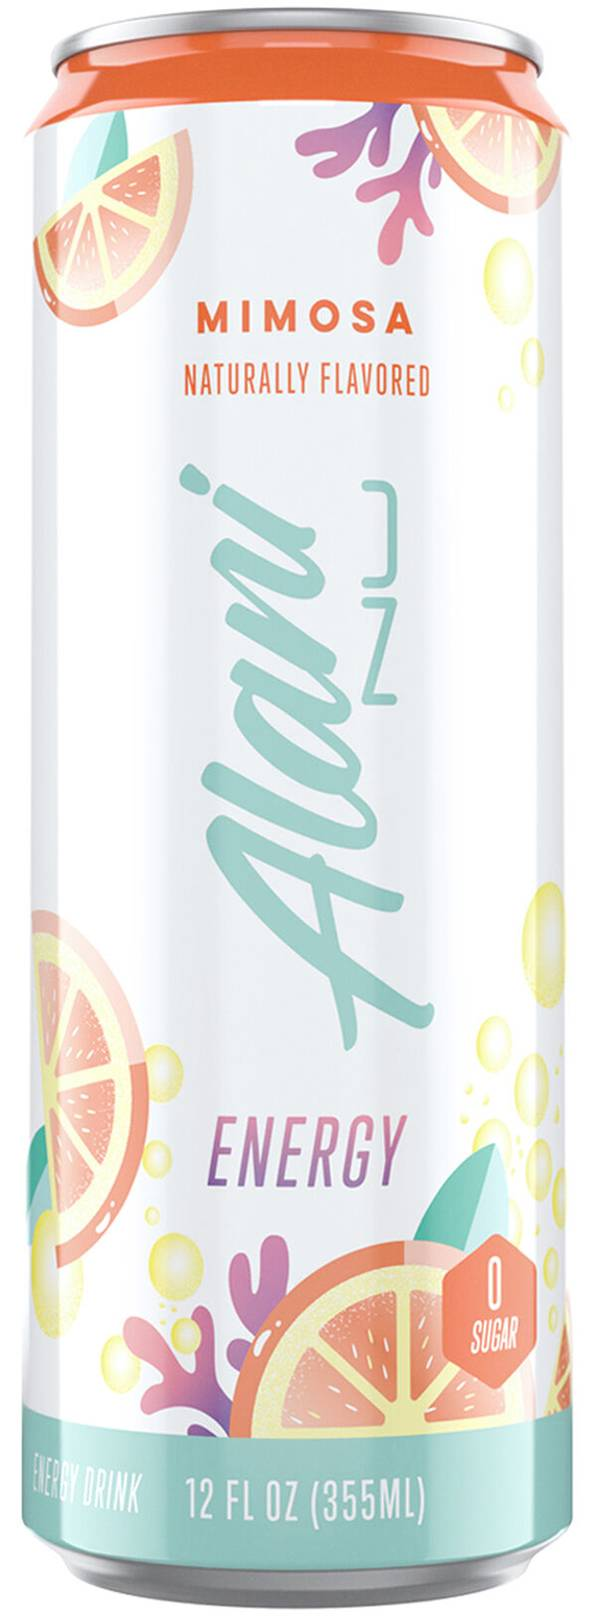 Alani Nu 12 oz. Energy Drink - Mimosa product image